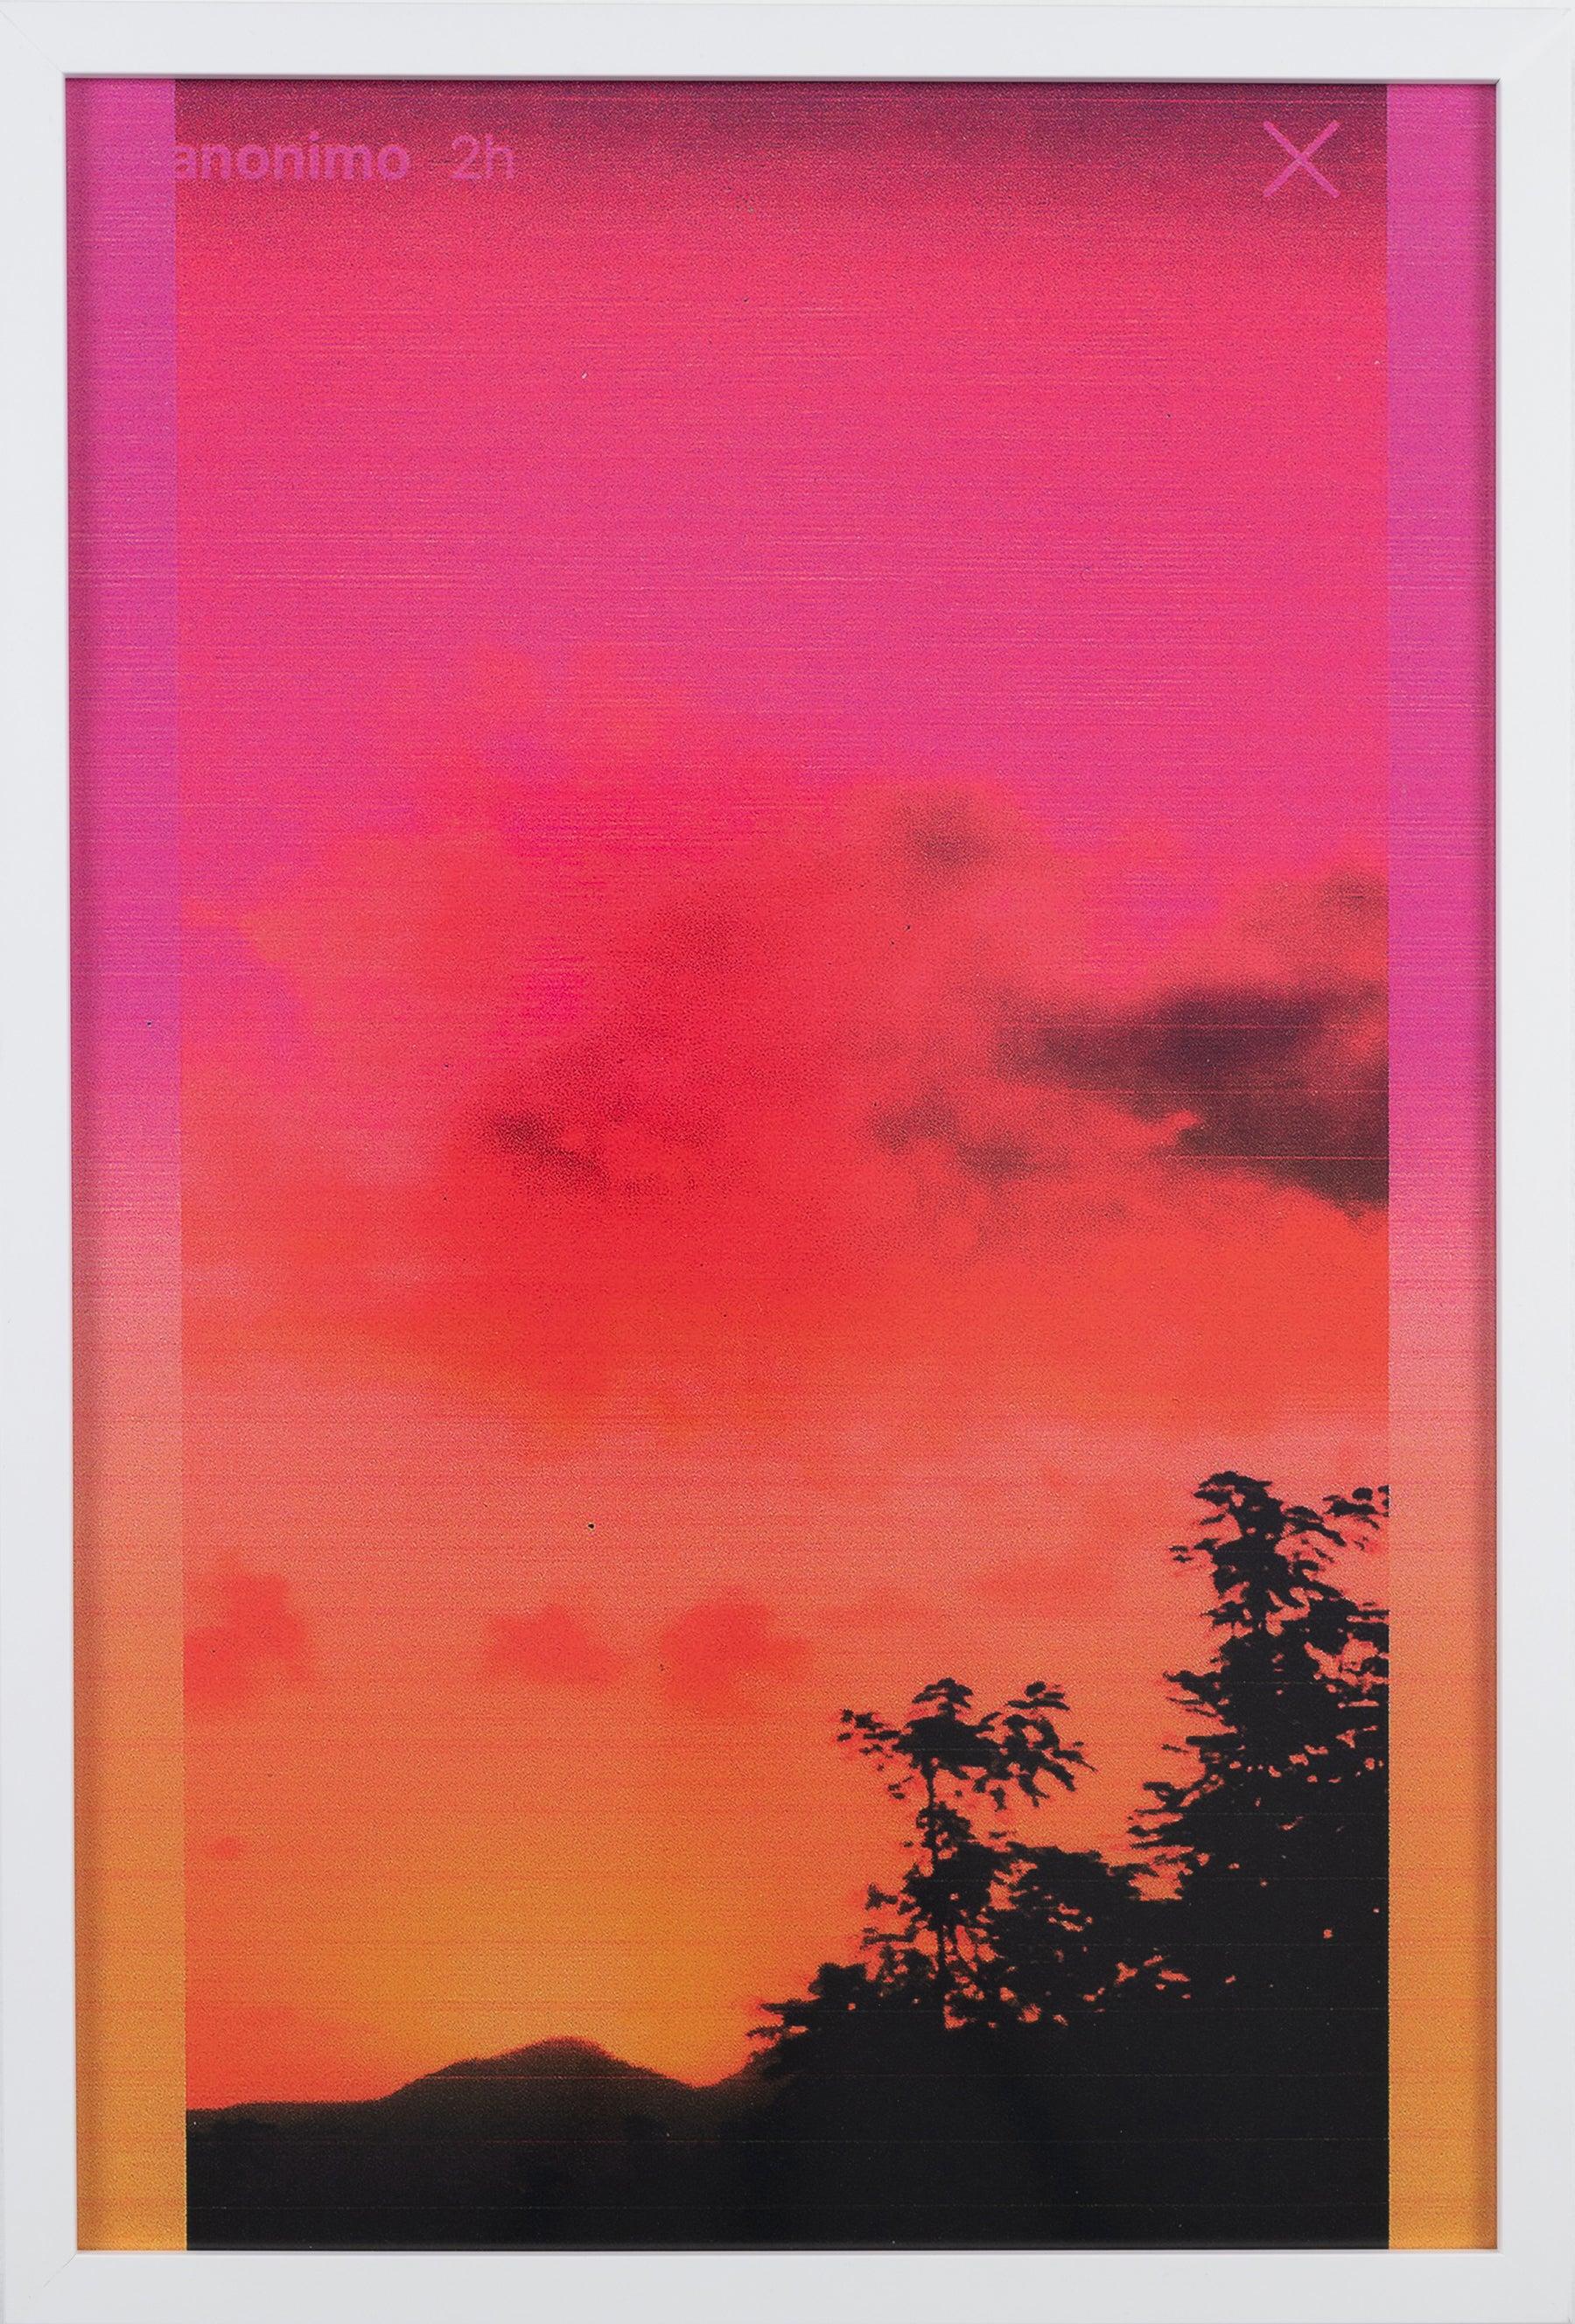 Dusk/Daybreak 1 Framed Color Photography Print  30 x 20 in. Red Orange Sunset